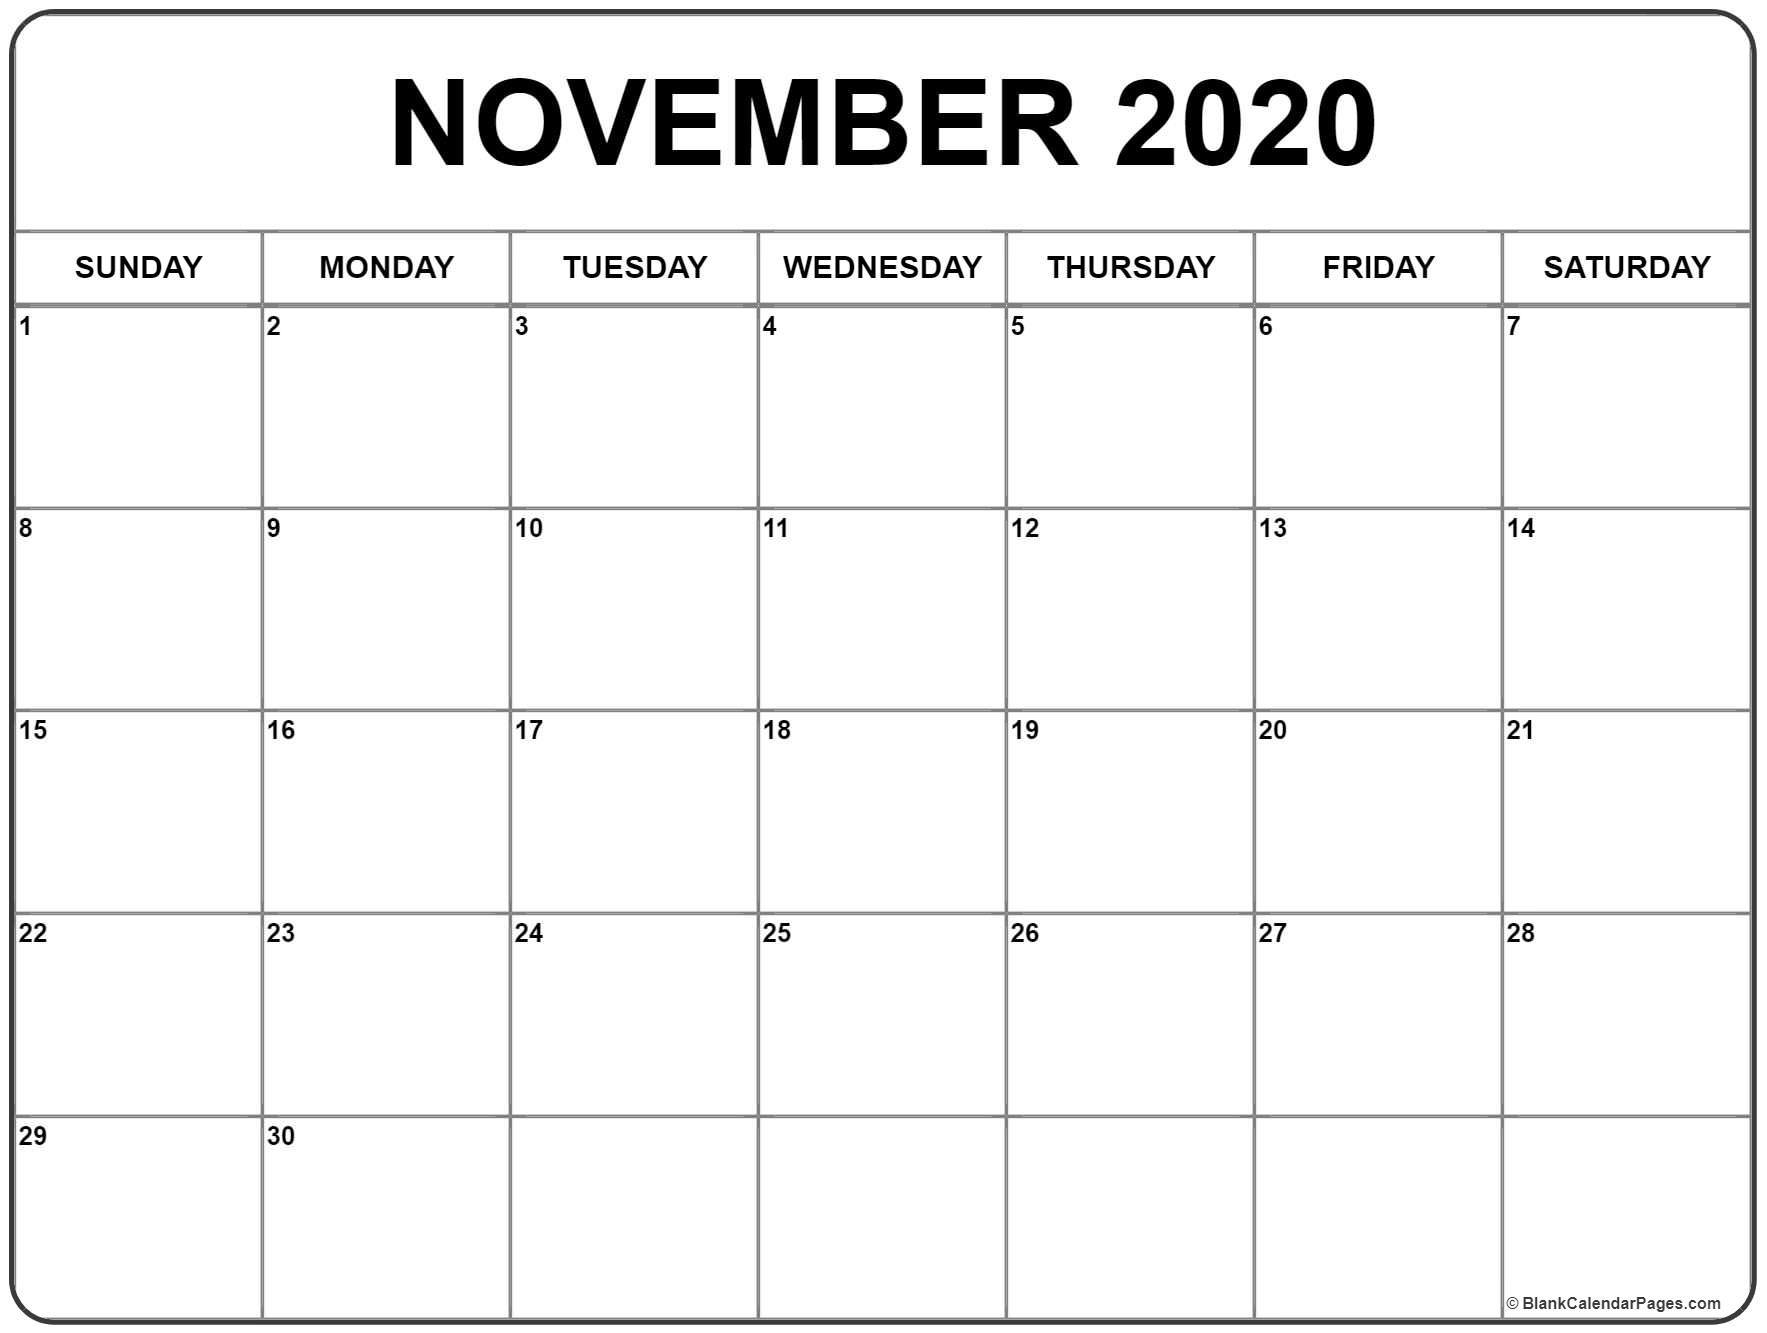 image about Printable November Calendar named 2020 Calendar November Printable November 2020 Calendar